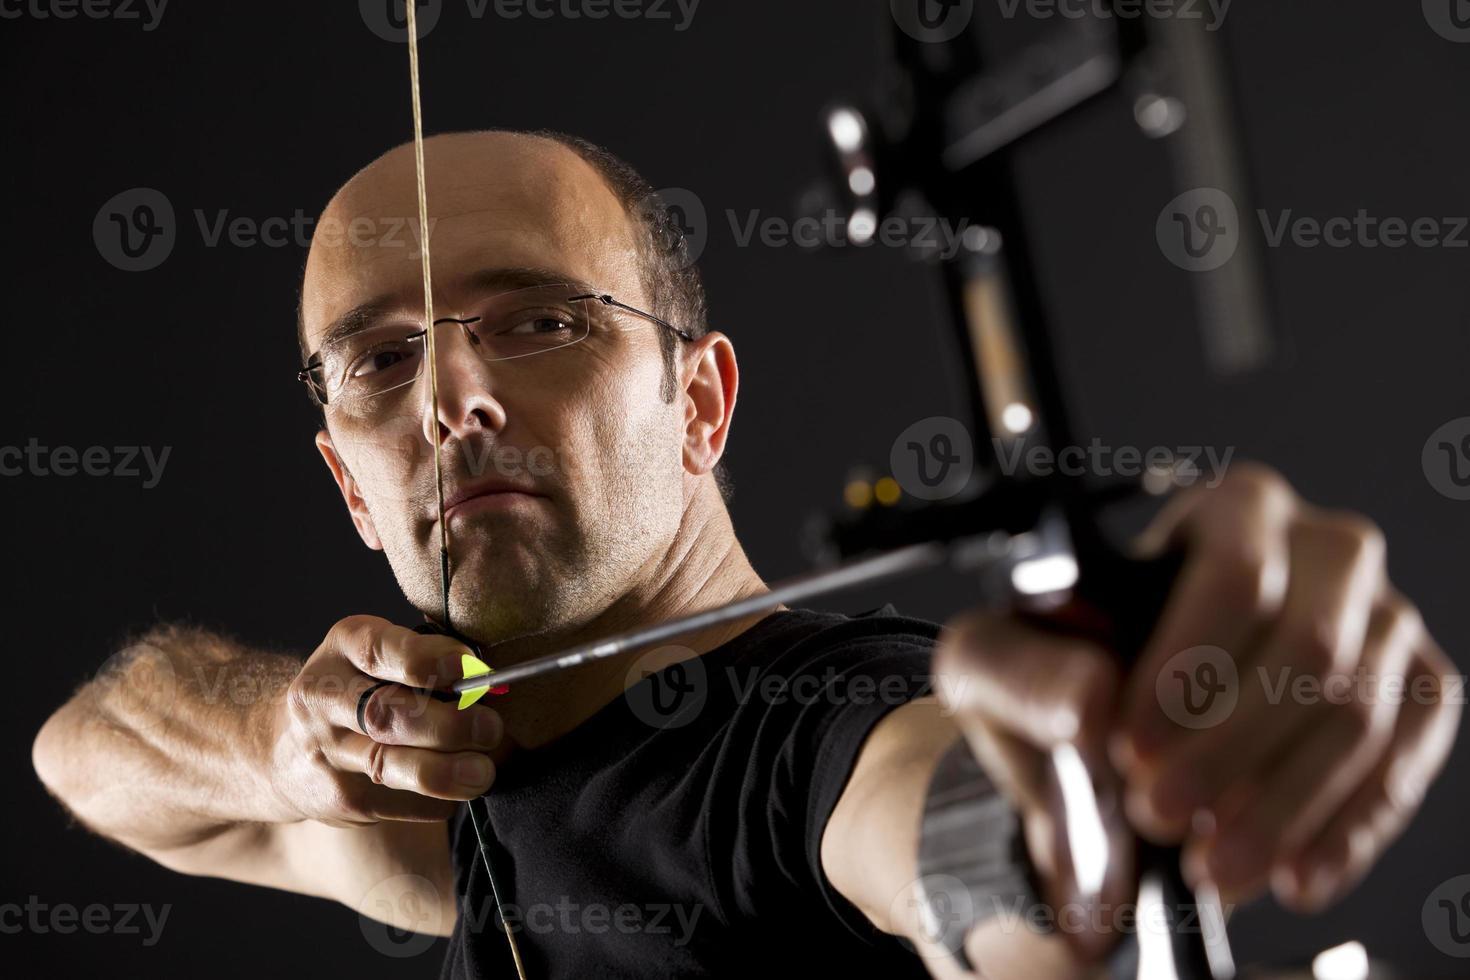 Bowman aiming, side view. photo